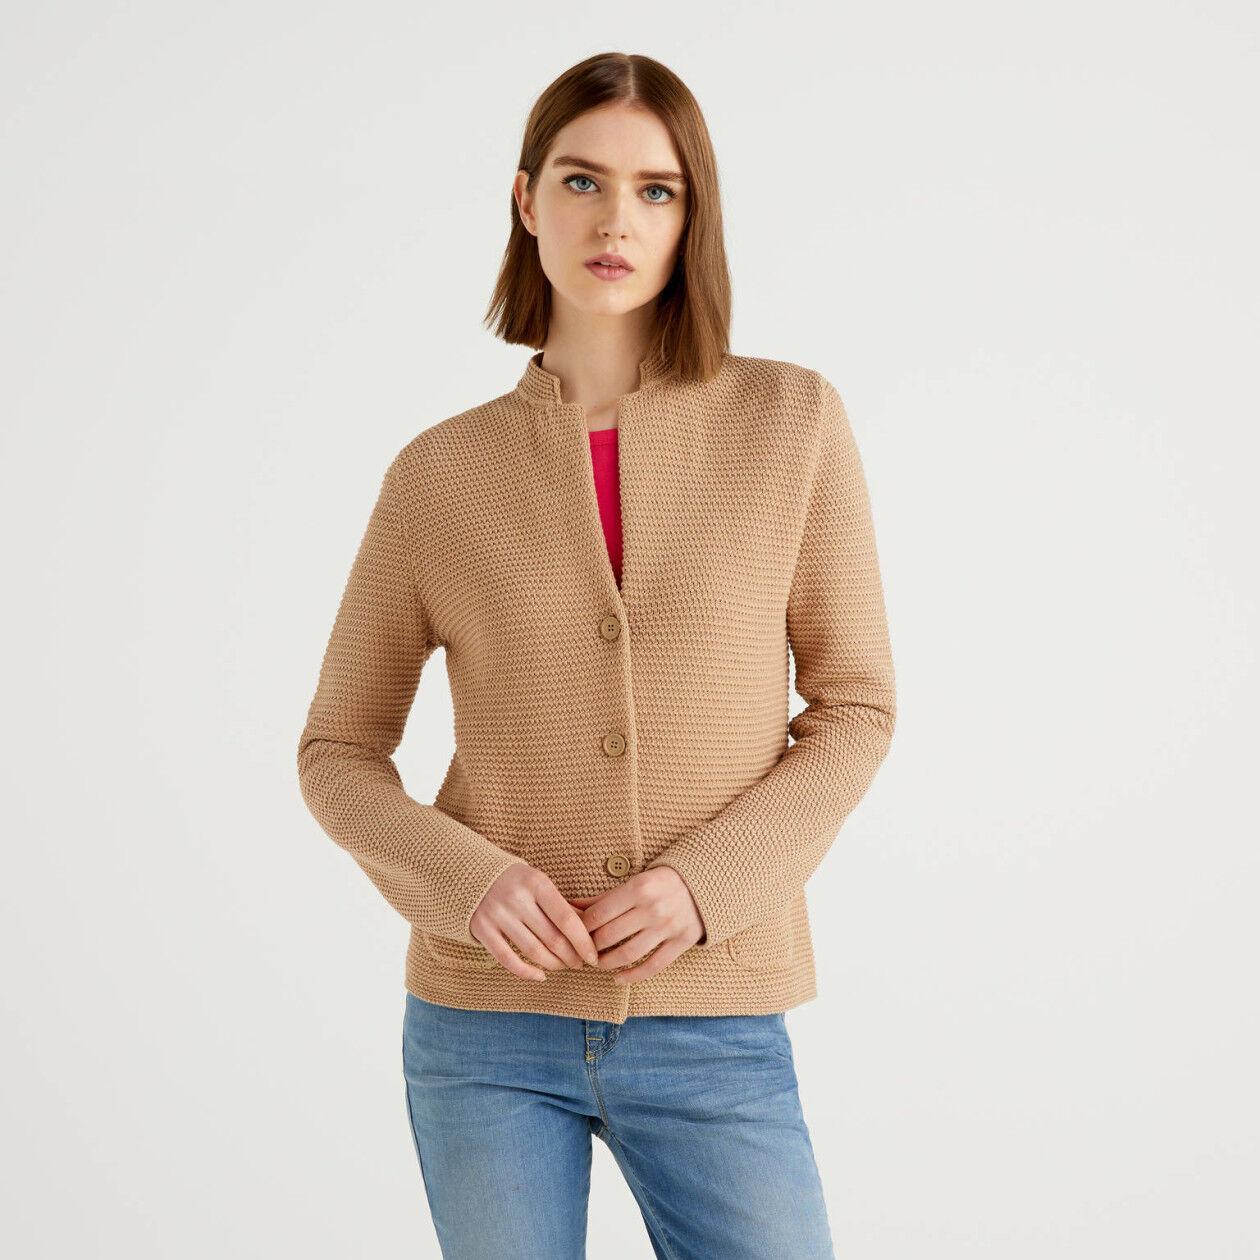 Knit jacket